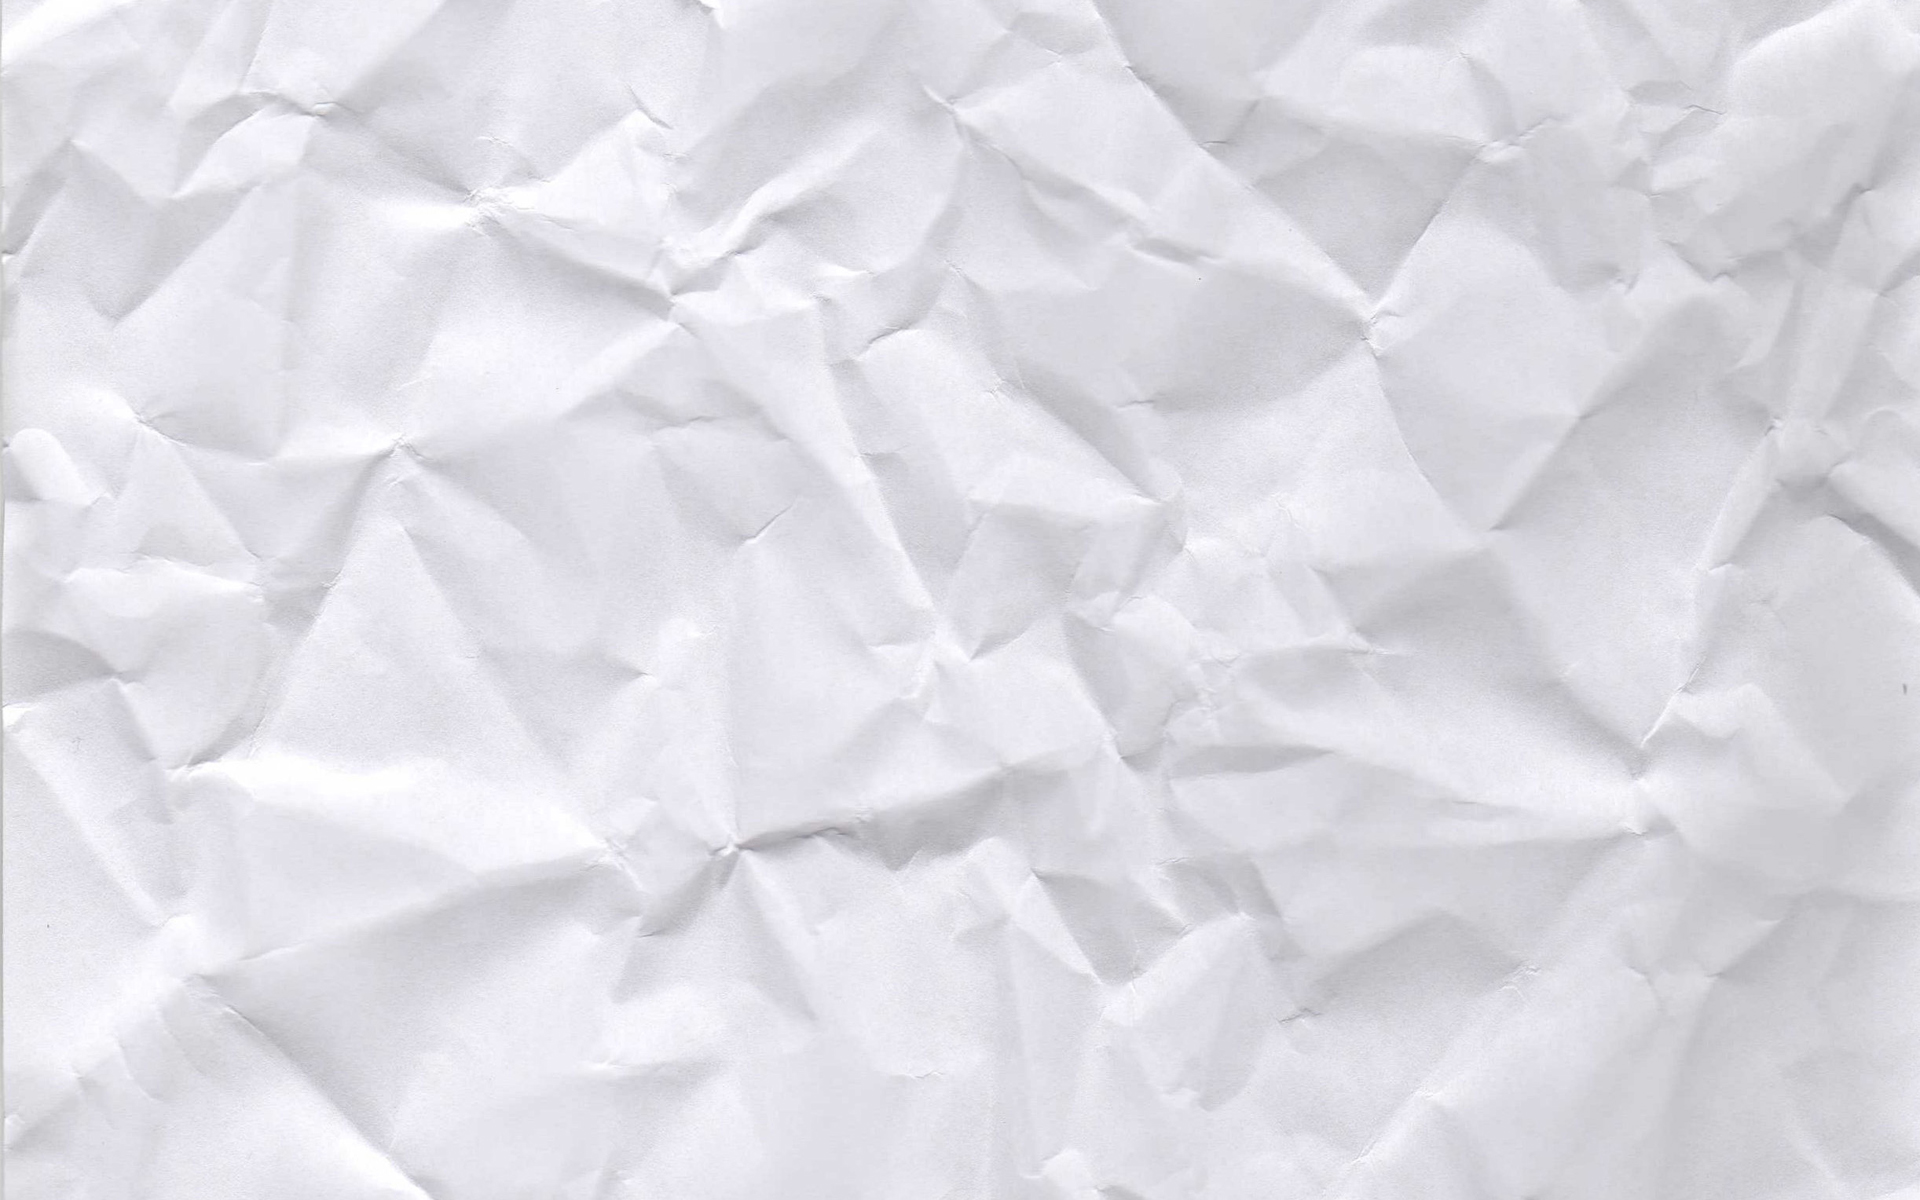 Crumpled paper wallpaper 1920x1200 10248 for Paper wallpaper